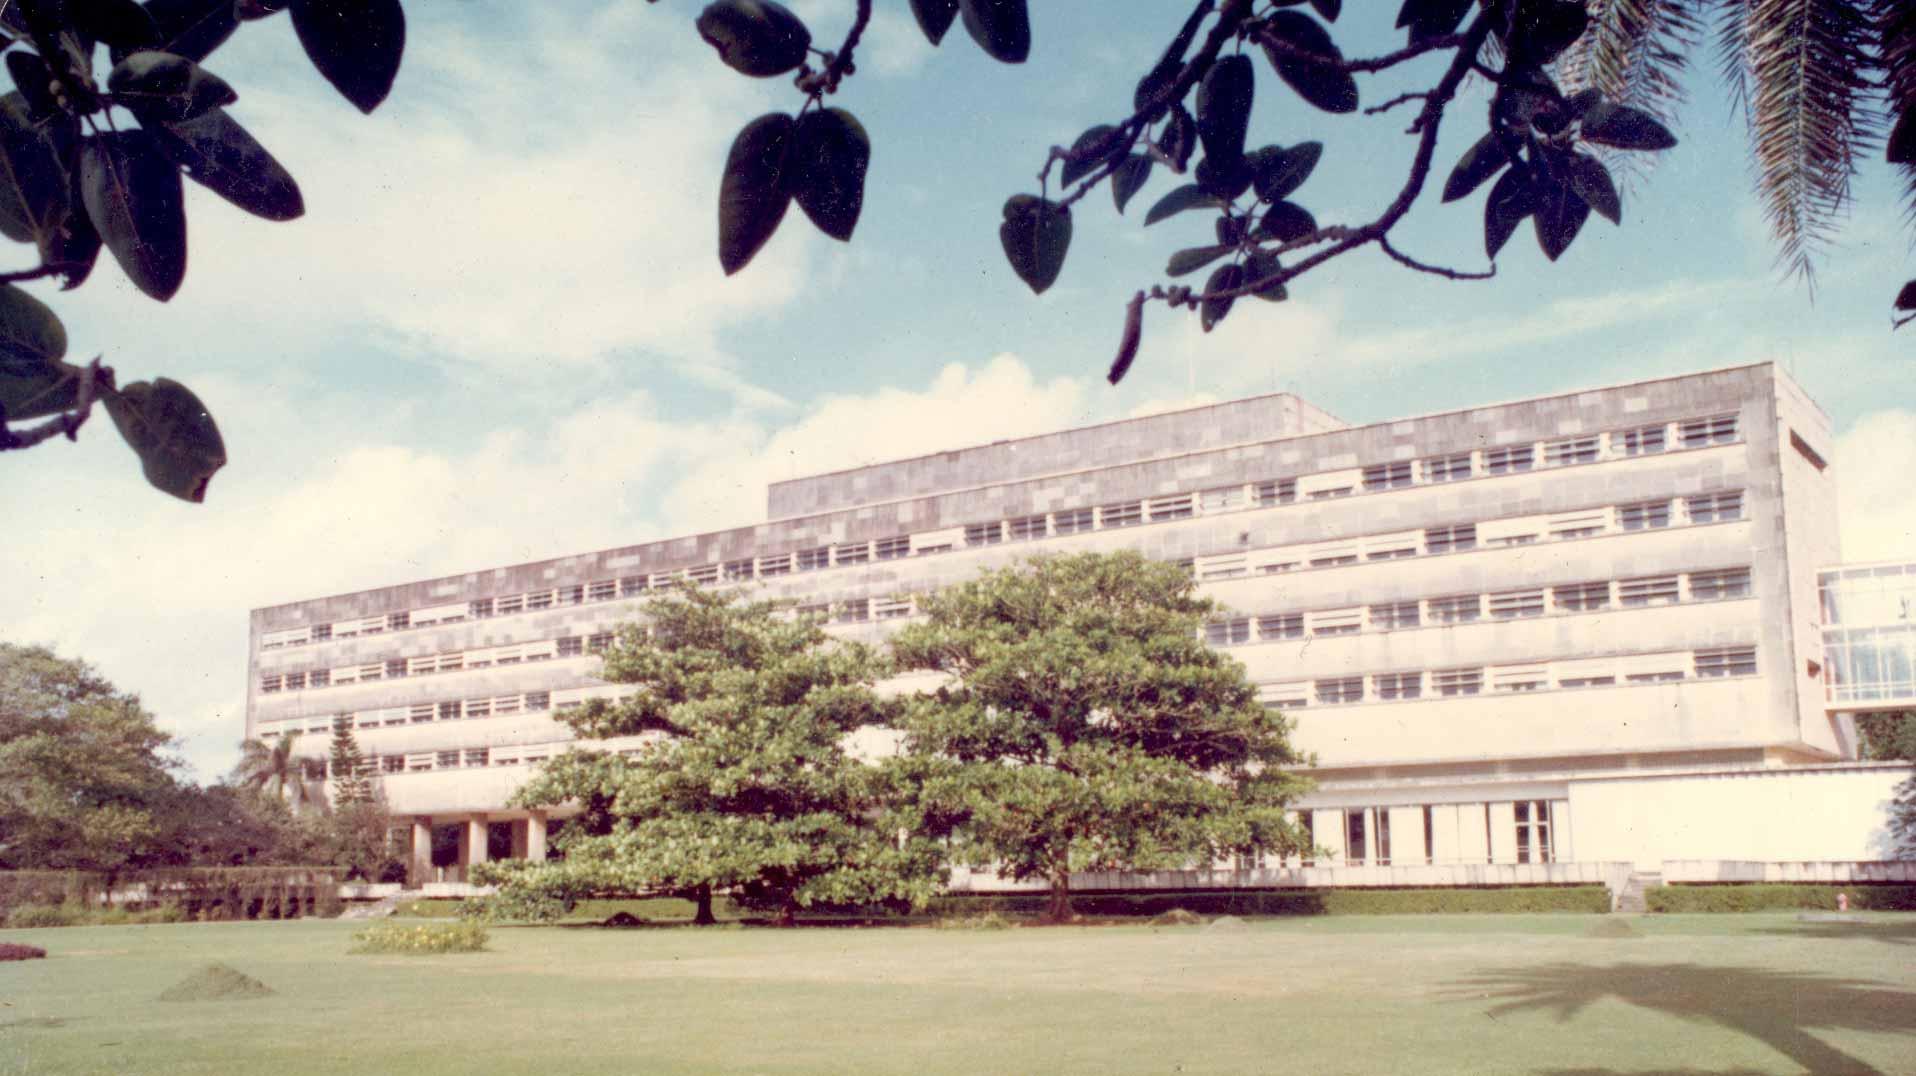 Administrative Officer | legal at Tata Institute of Fundamental Research – last date 06/01/2021